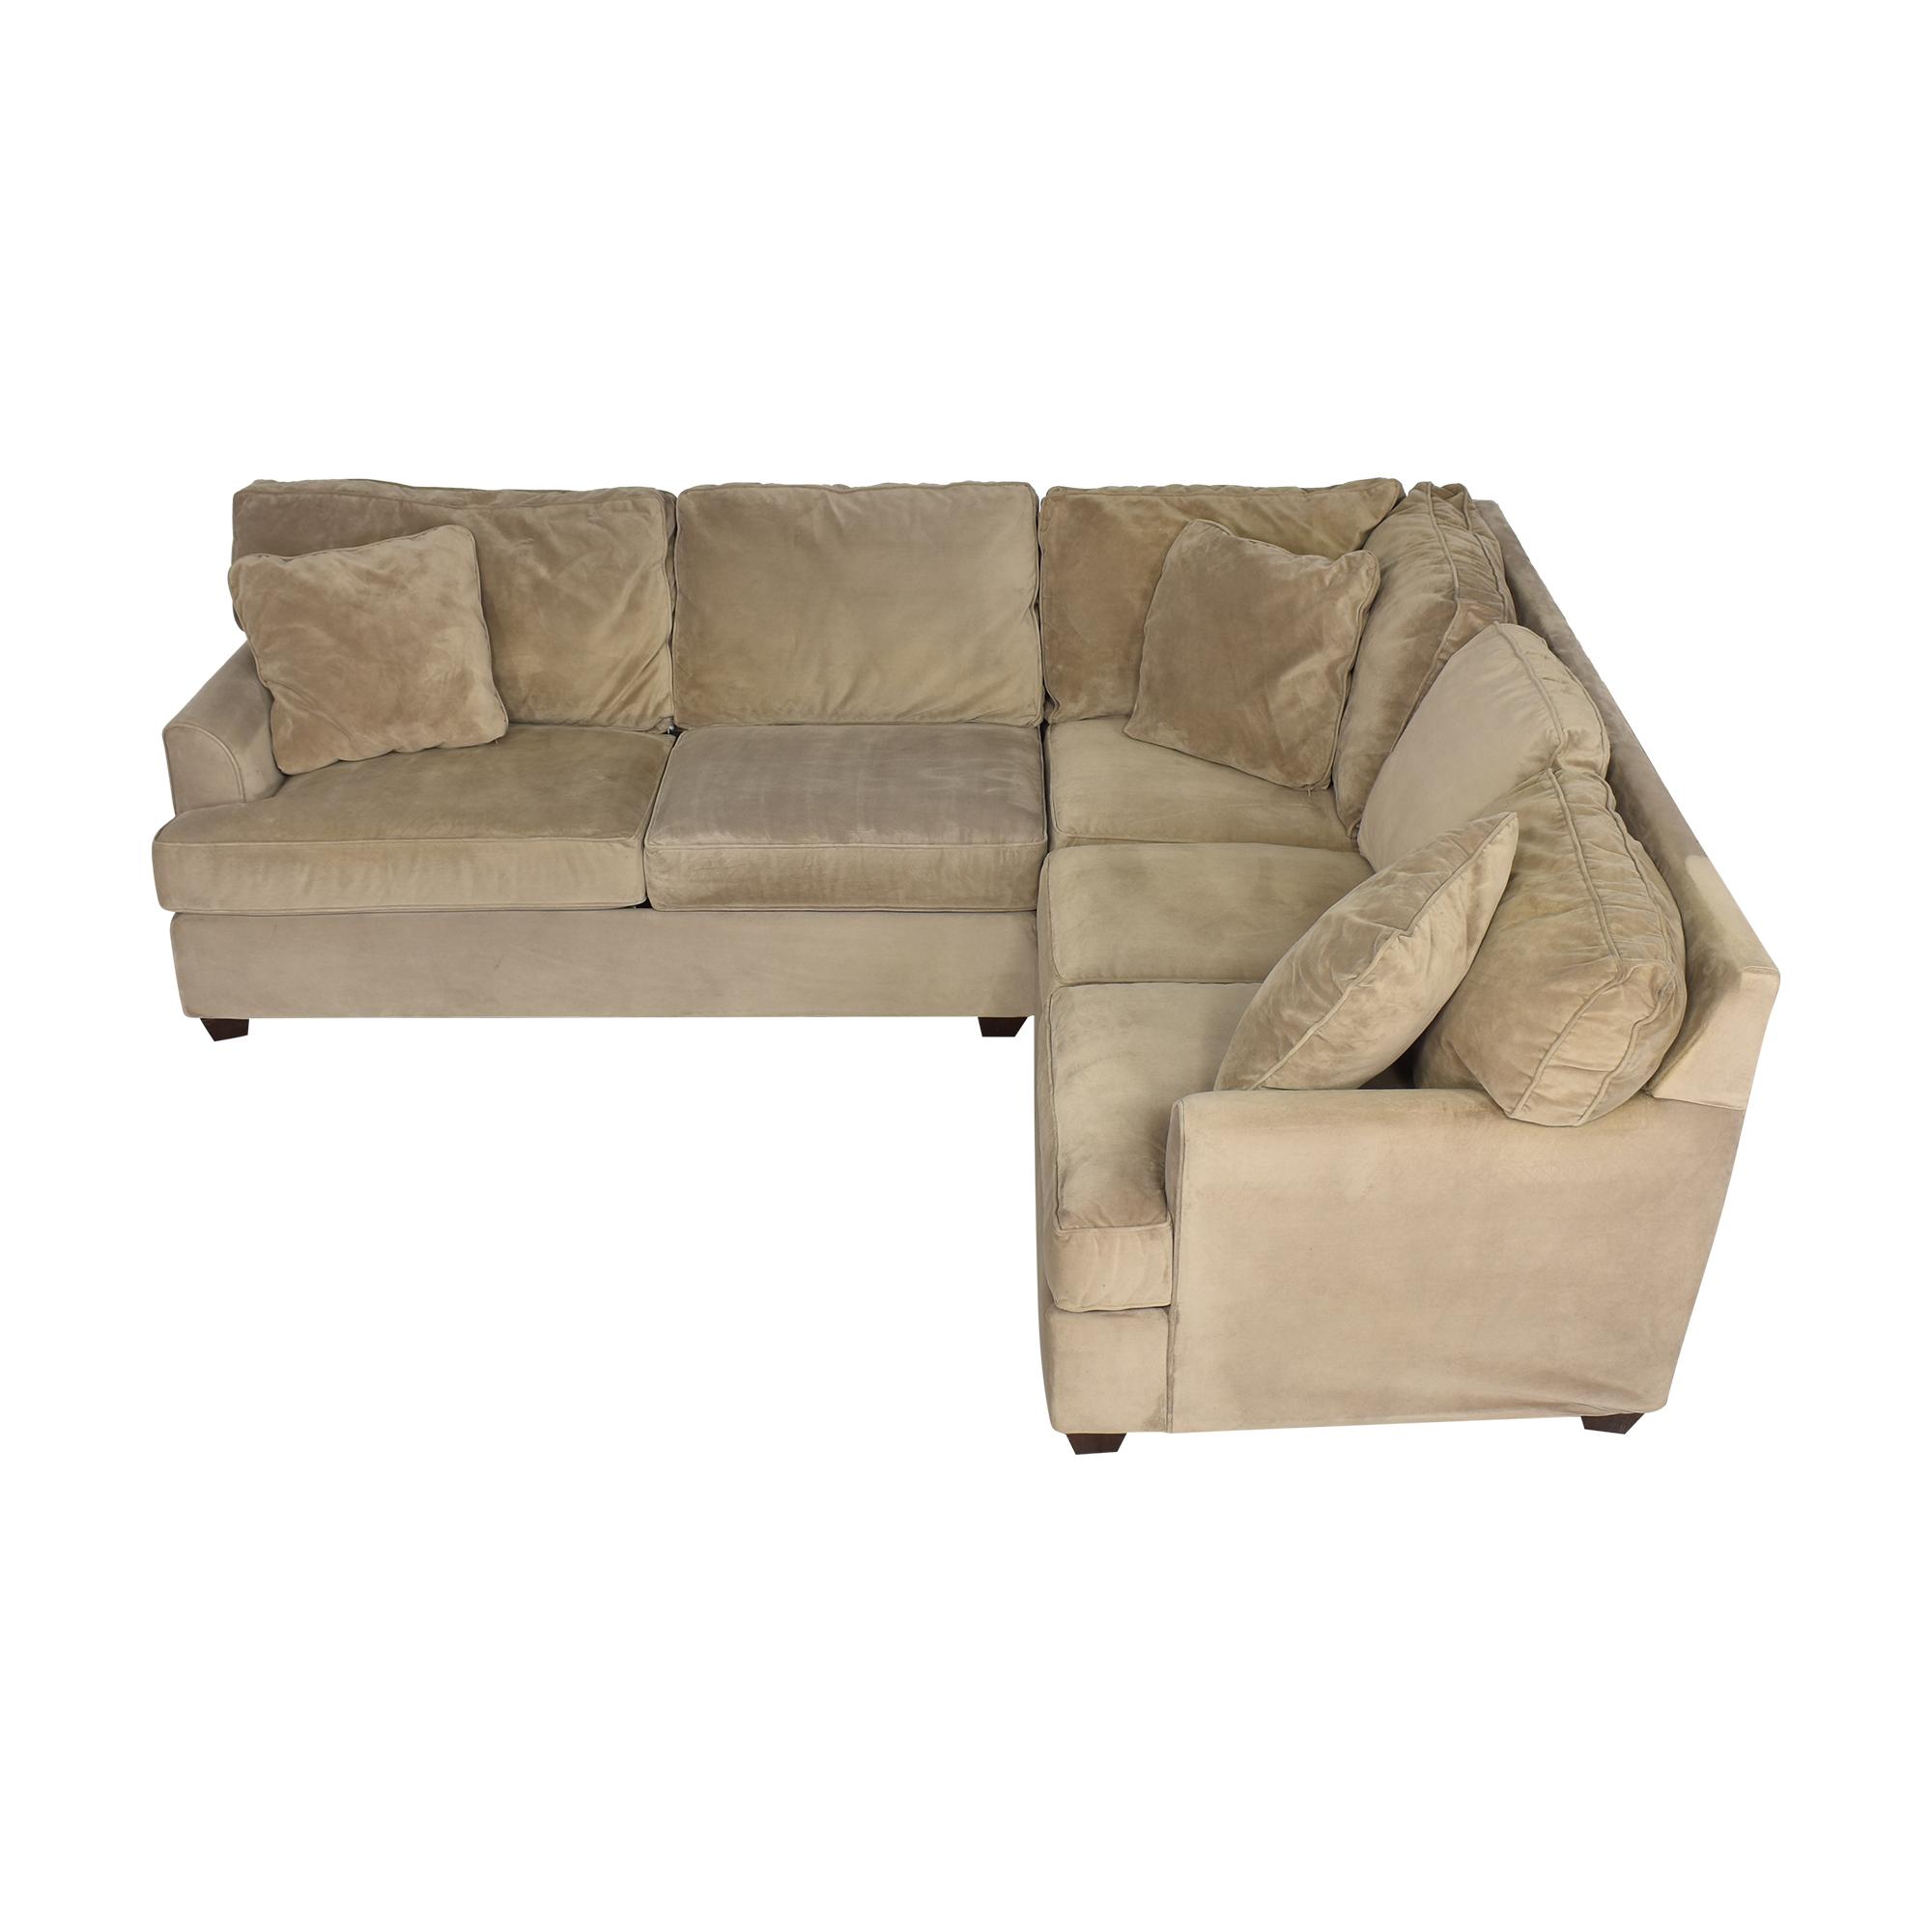 buy JC Penney Corner Sectional Sofa JC Penney Sofas